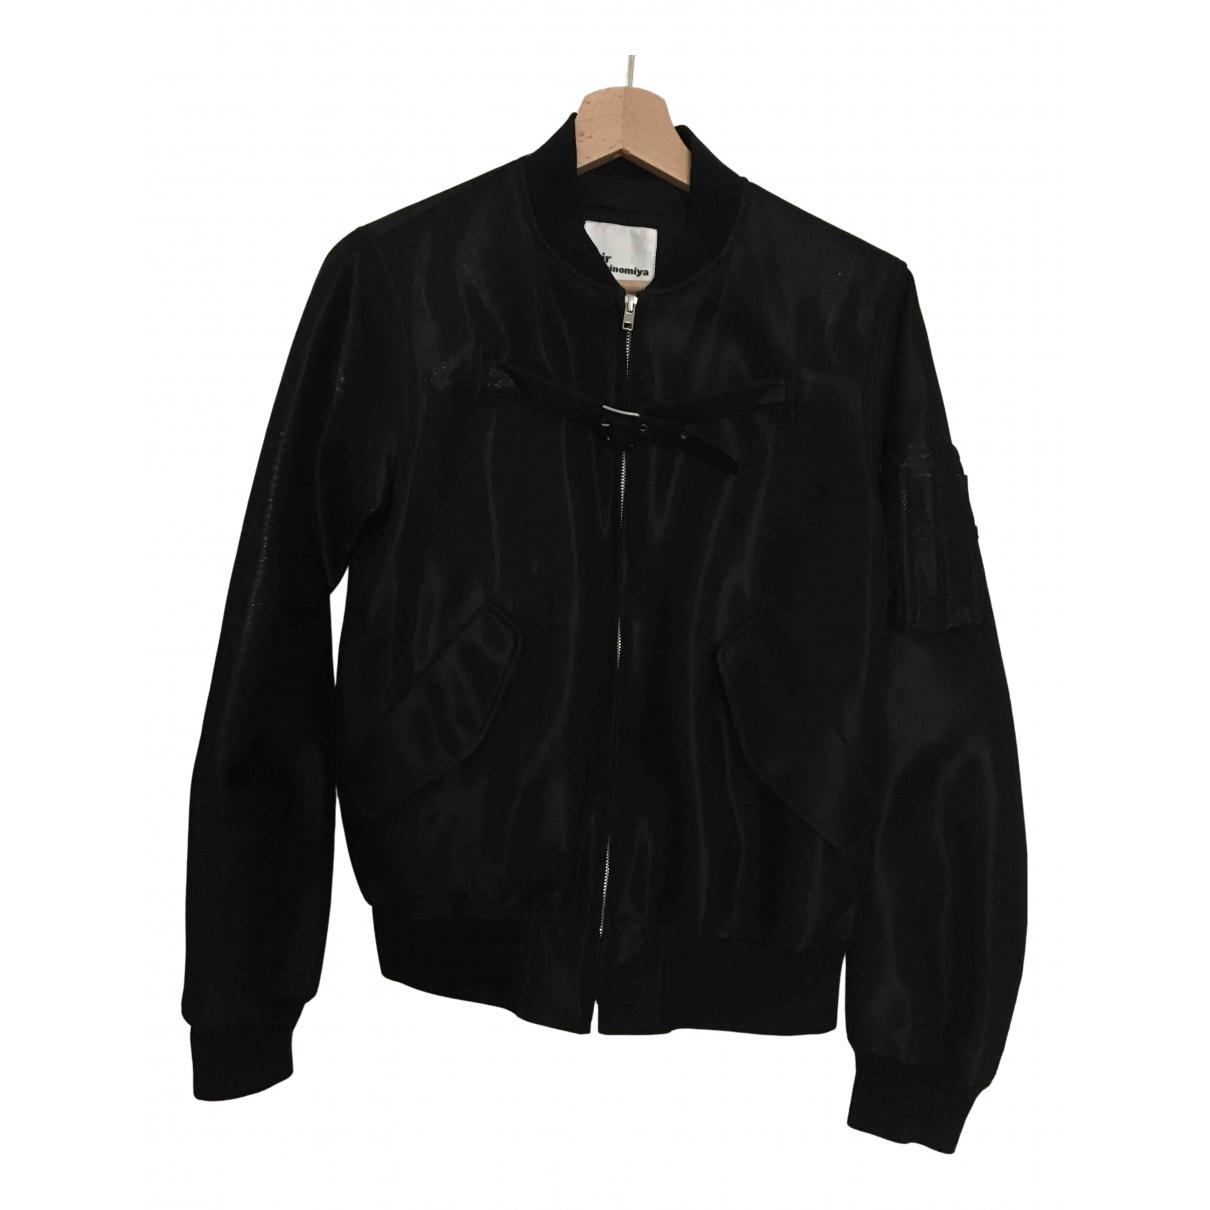 Noir By Kei Ninomoya N Black jacket for Women S International